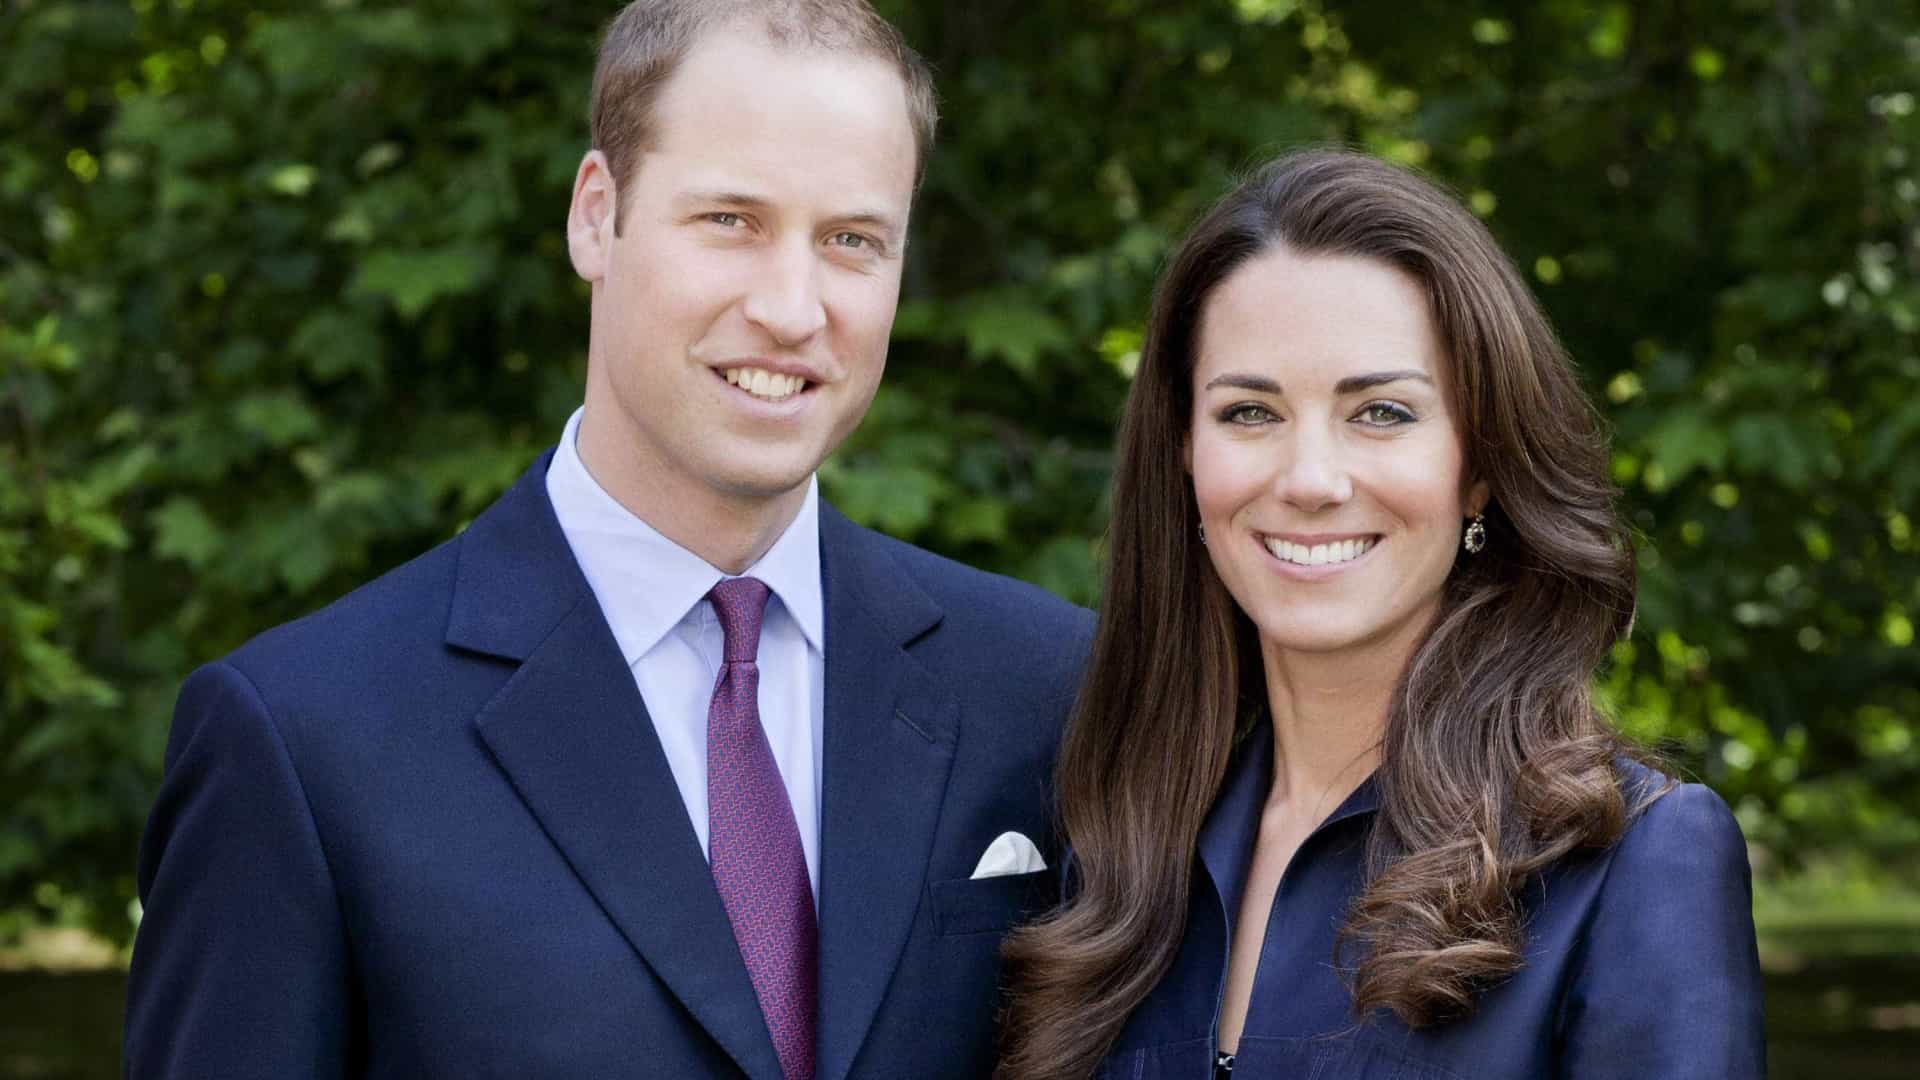 Kate Middleton terá presenteado o príncipe William no aniversário